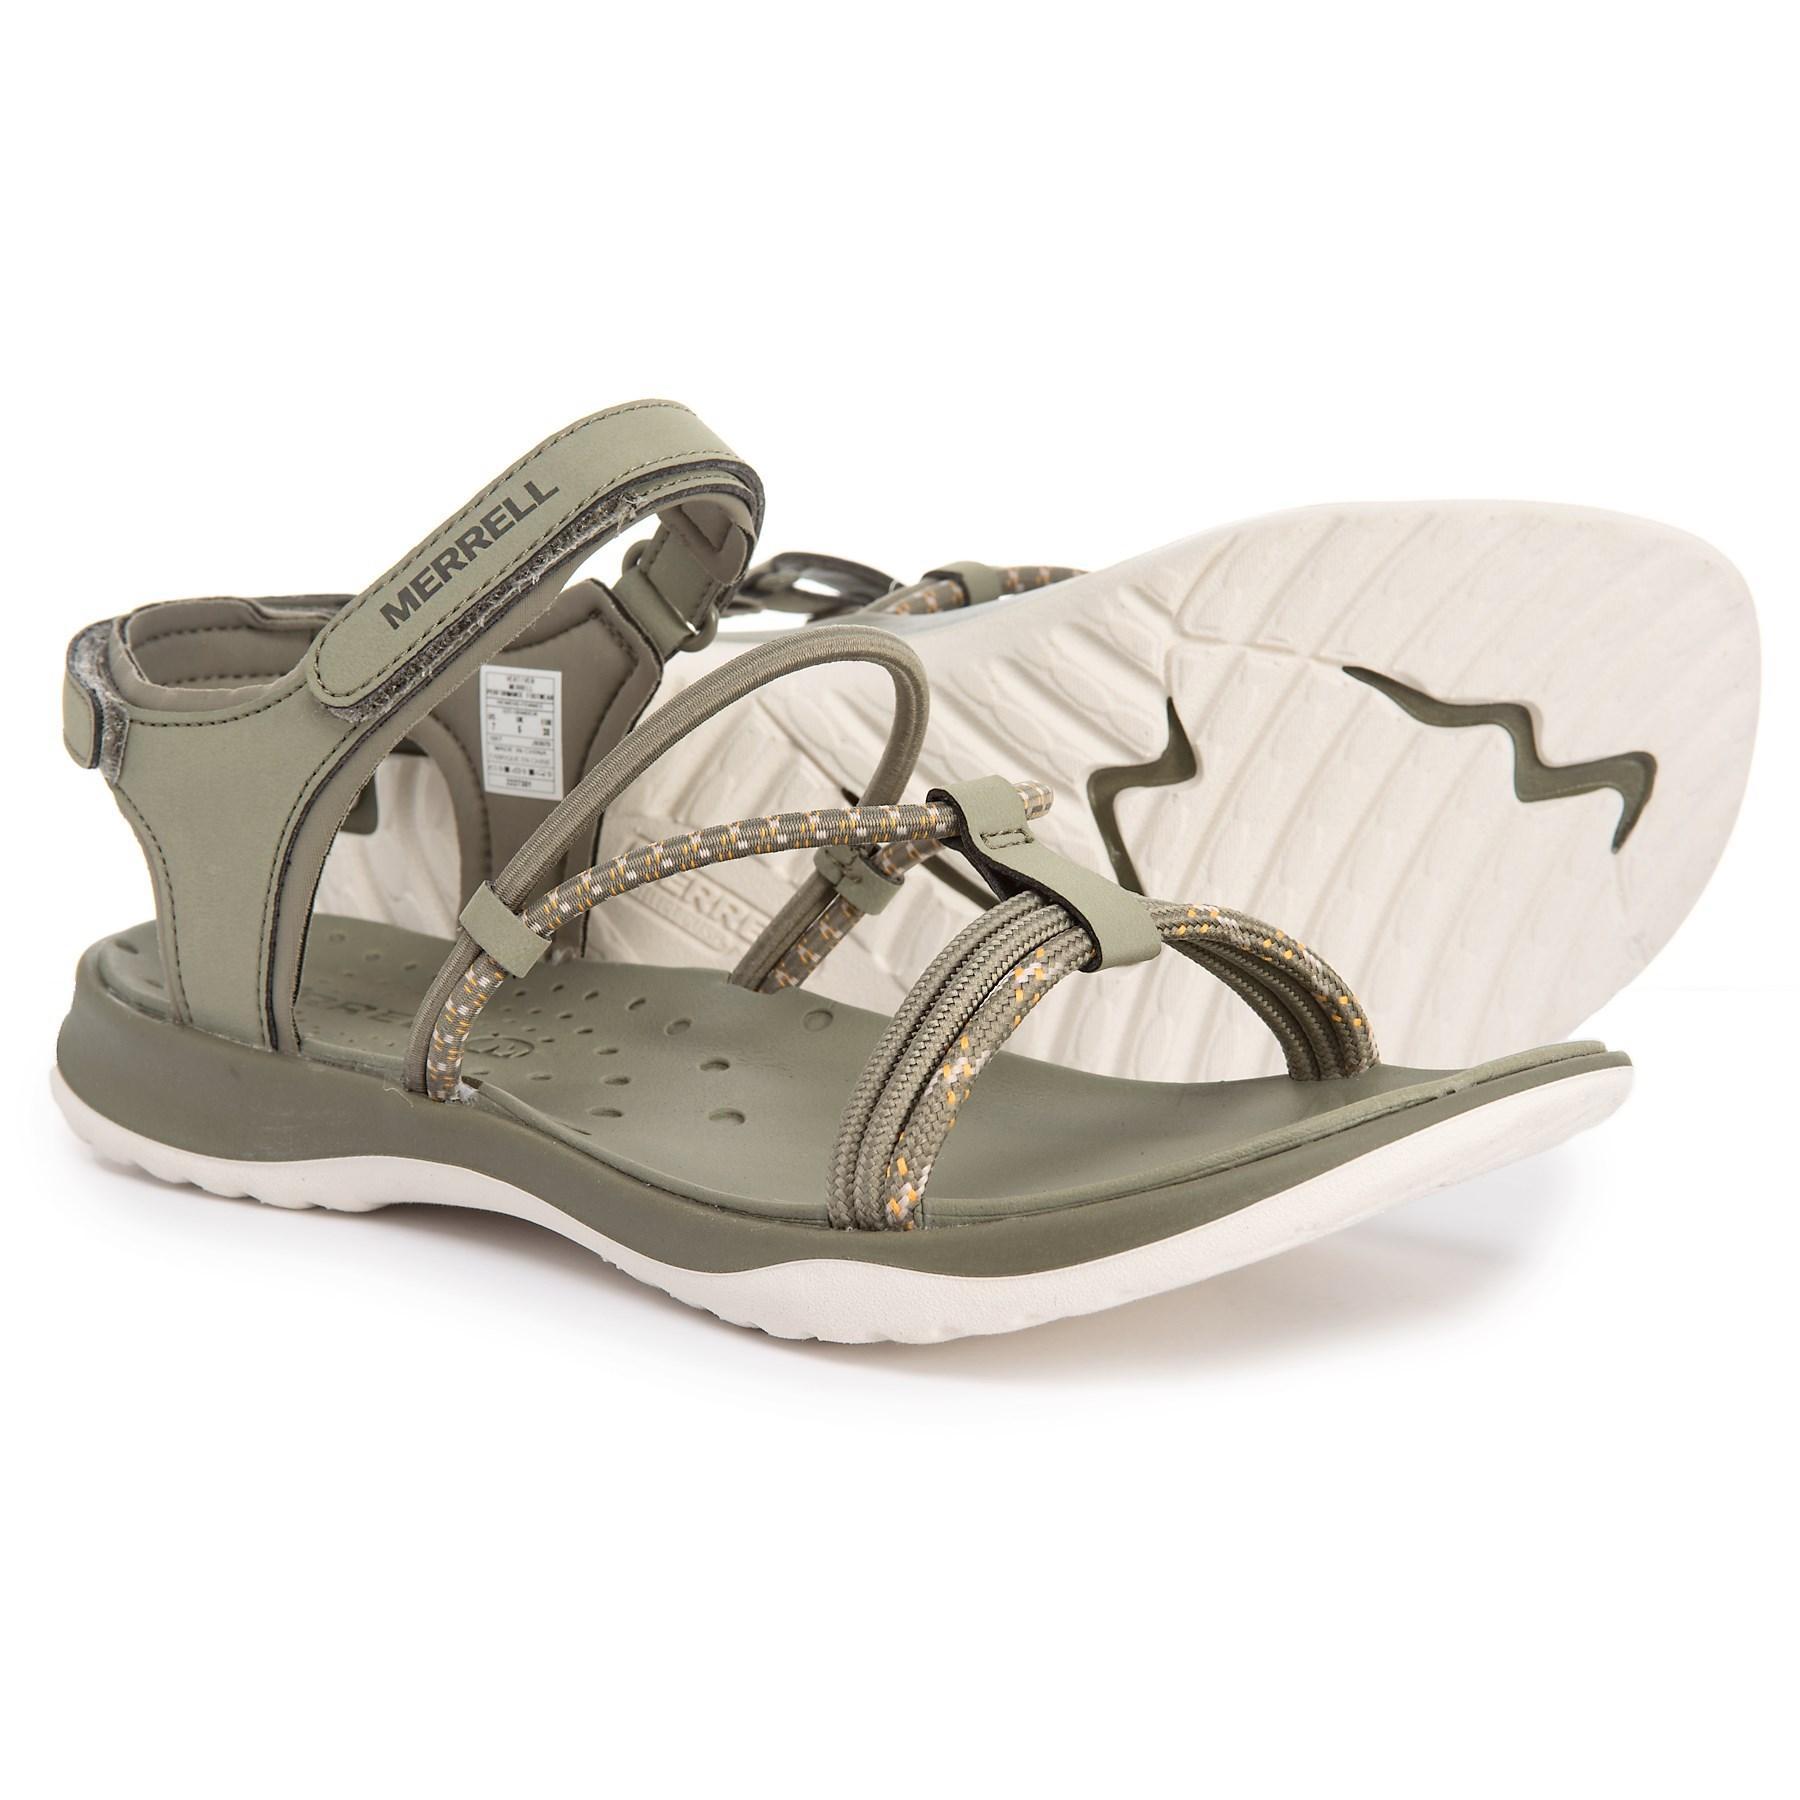 288815f578 Merrell - Multicolor Sunstone Strap Sandals (for Women) - Lyst. View  fullscreen